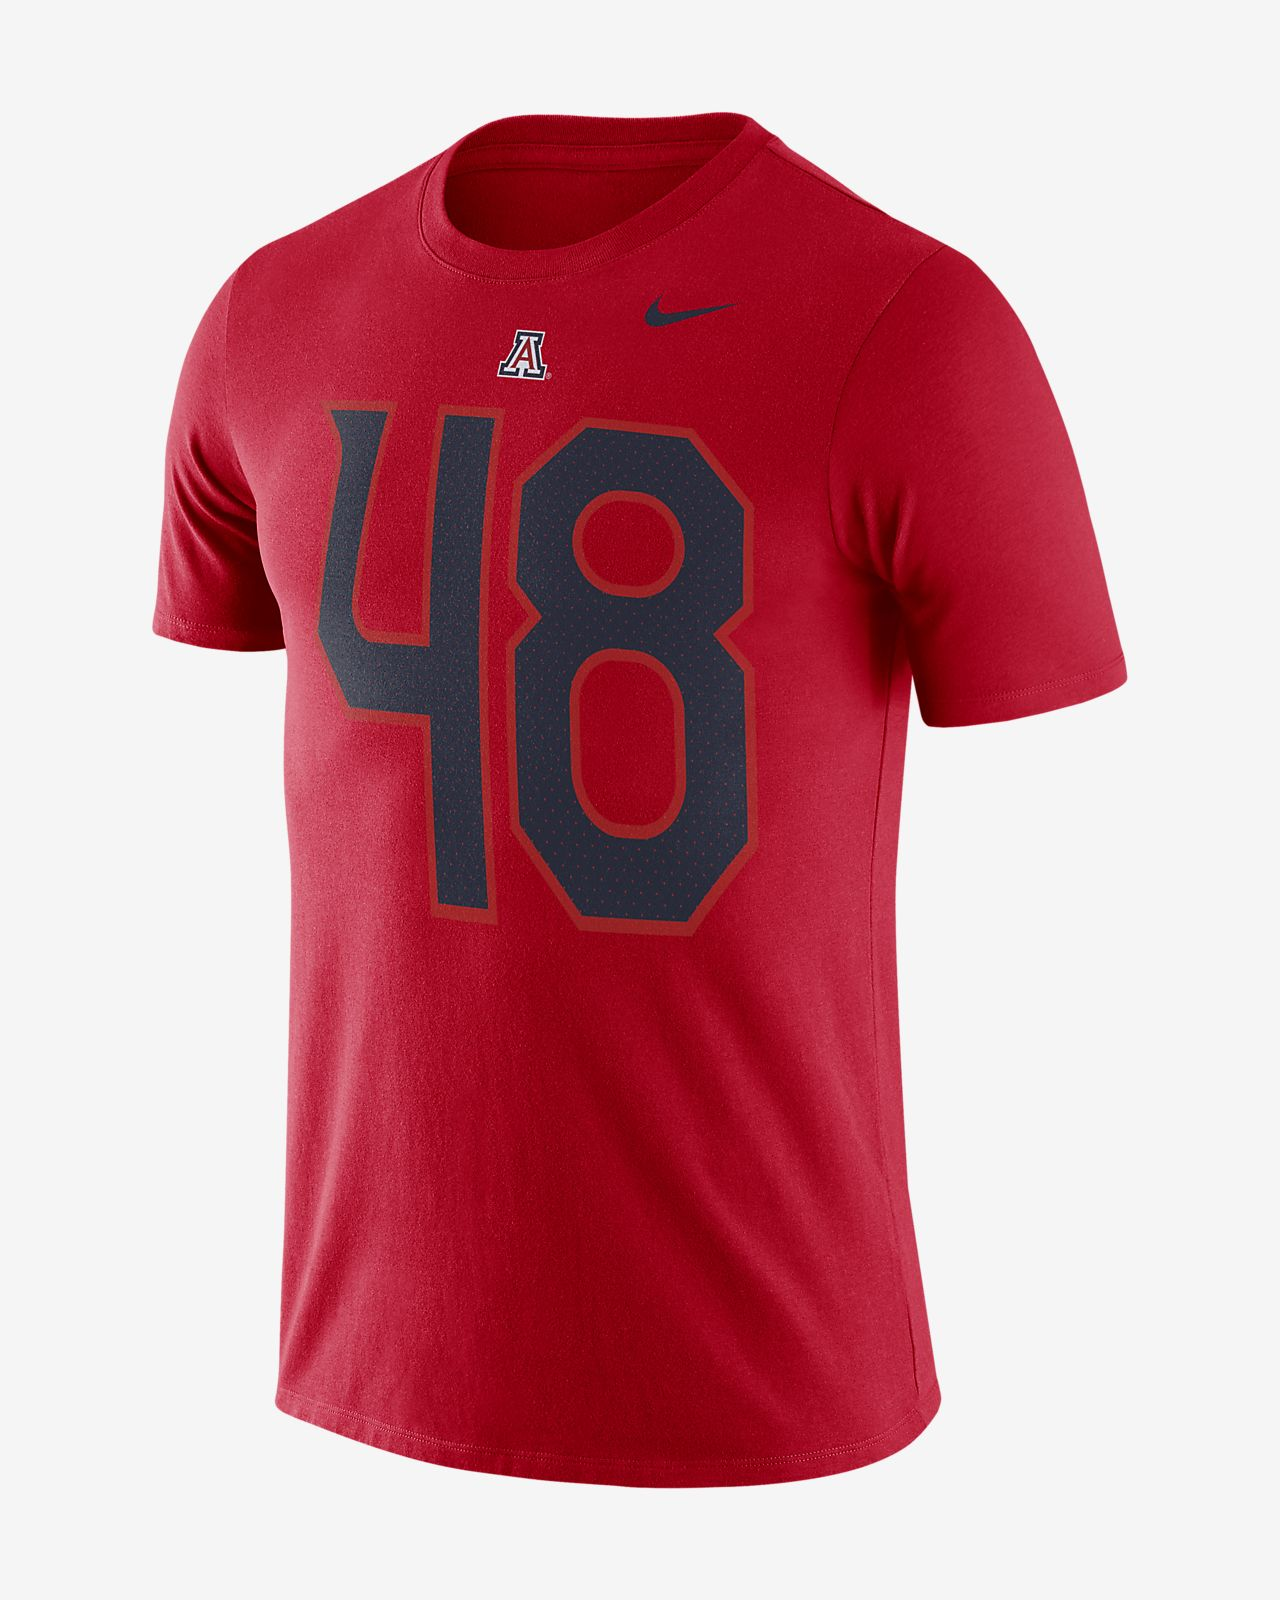 free shipping 99355 e99ea sweden rob gronkowski arizona jersey 67bab c18f2